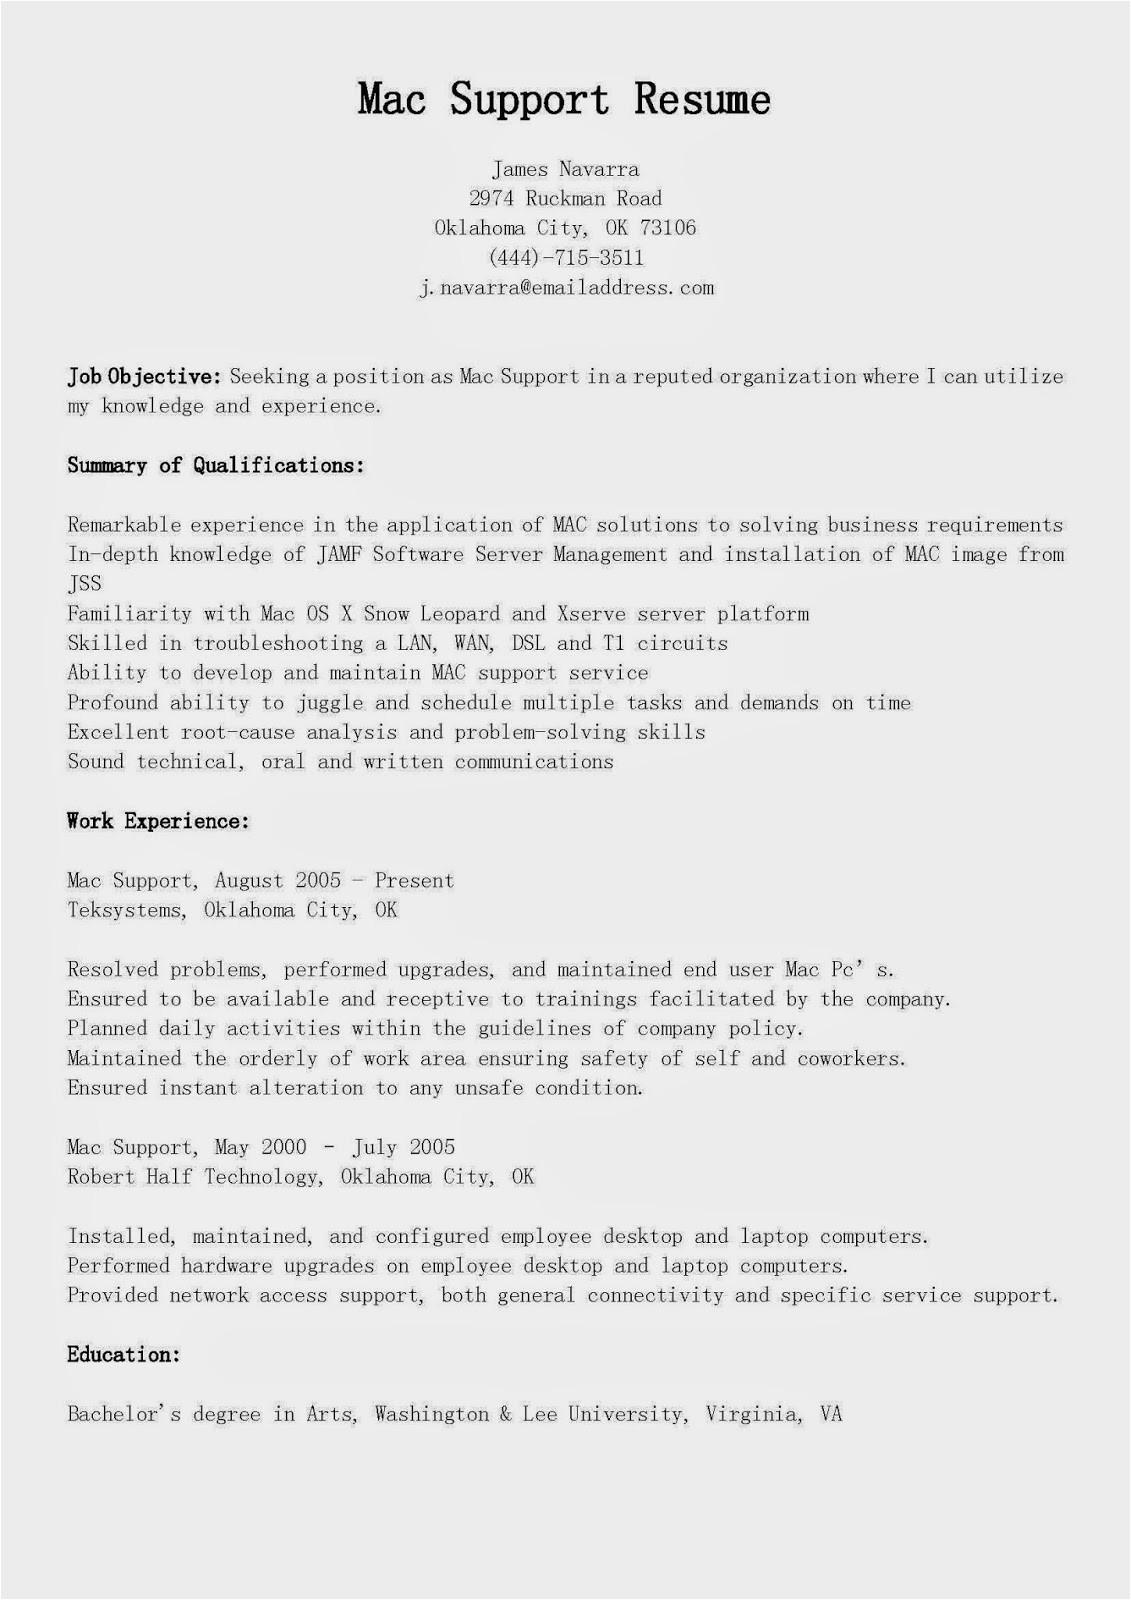 mac support resume sample